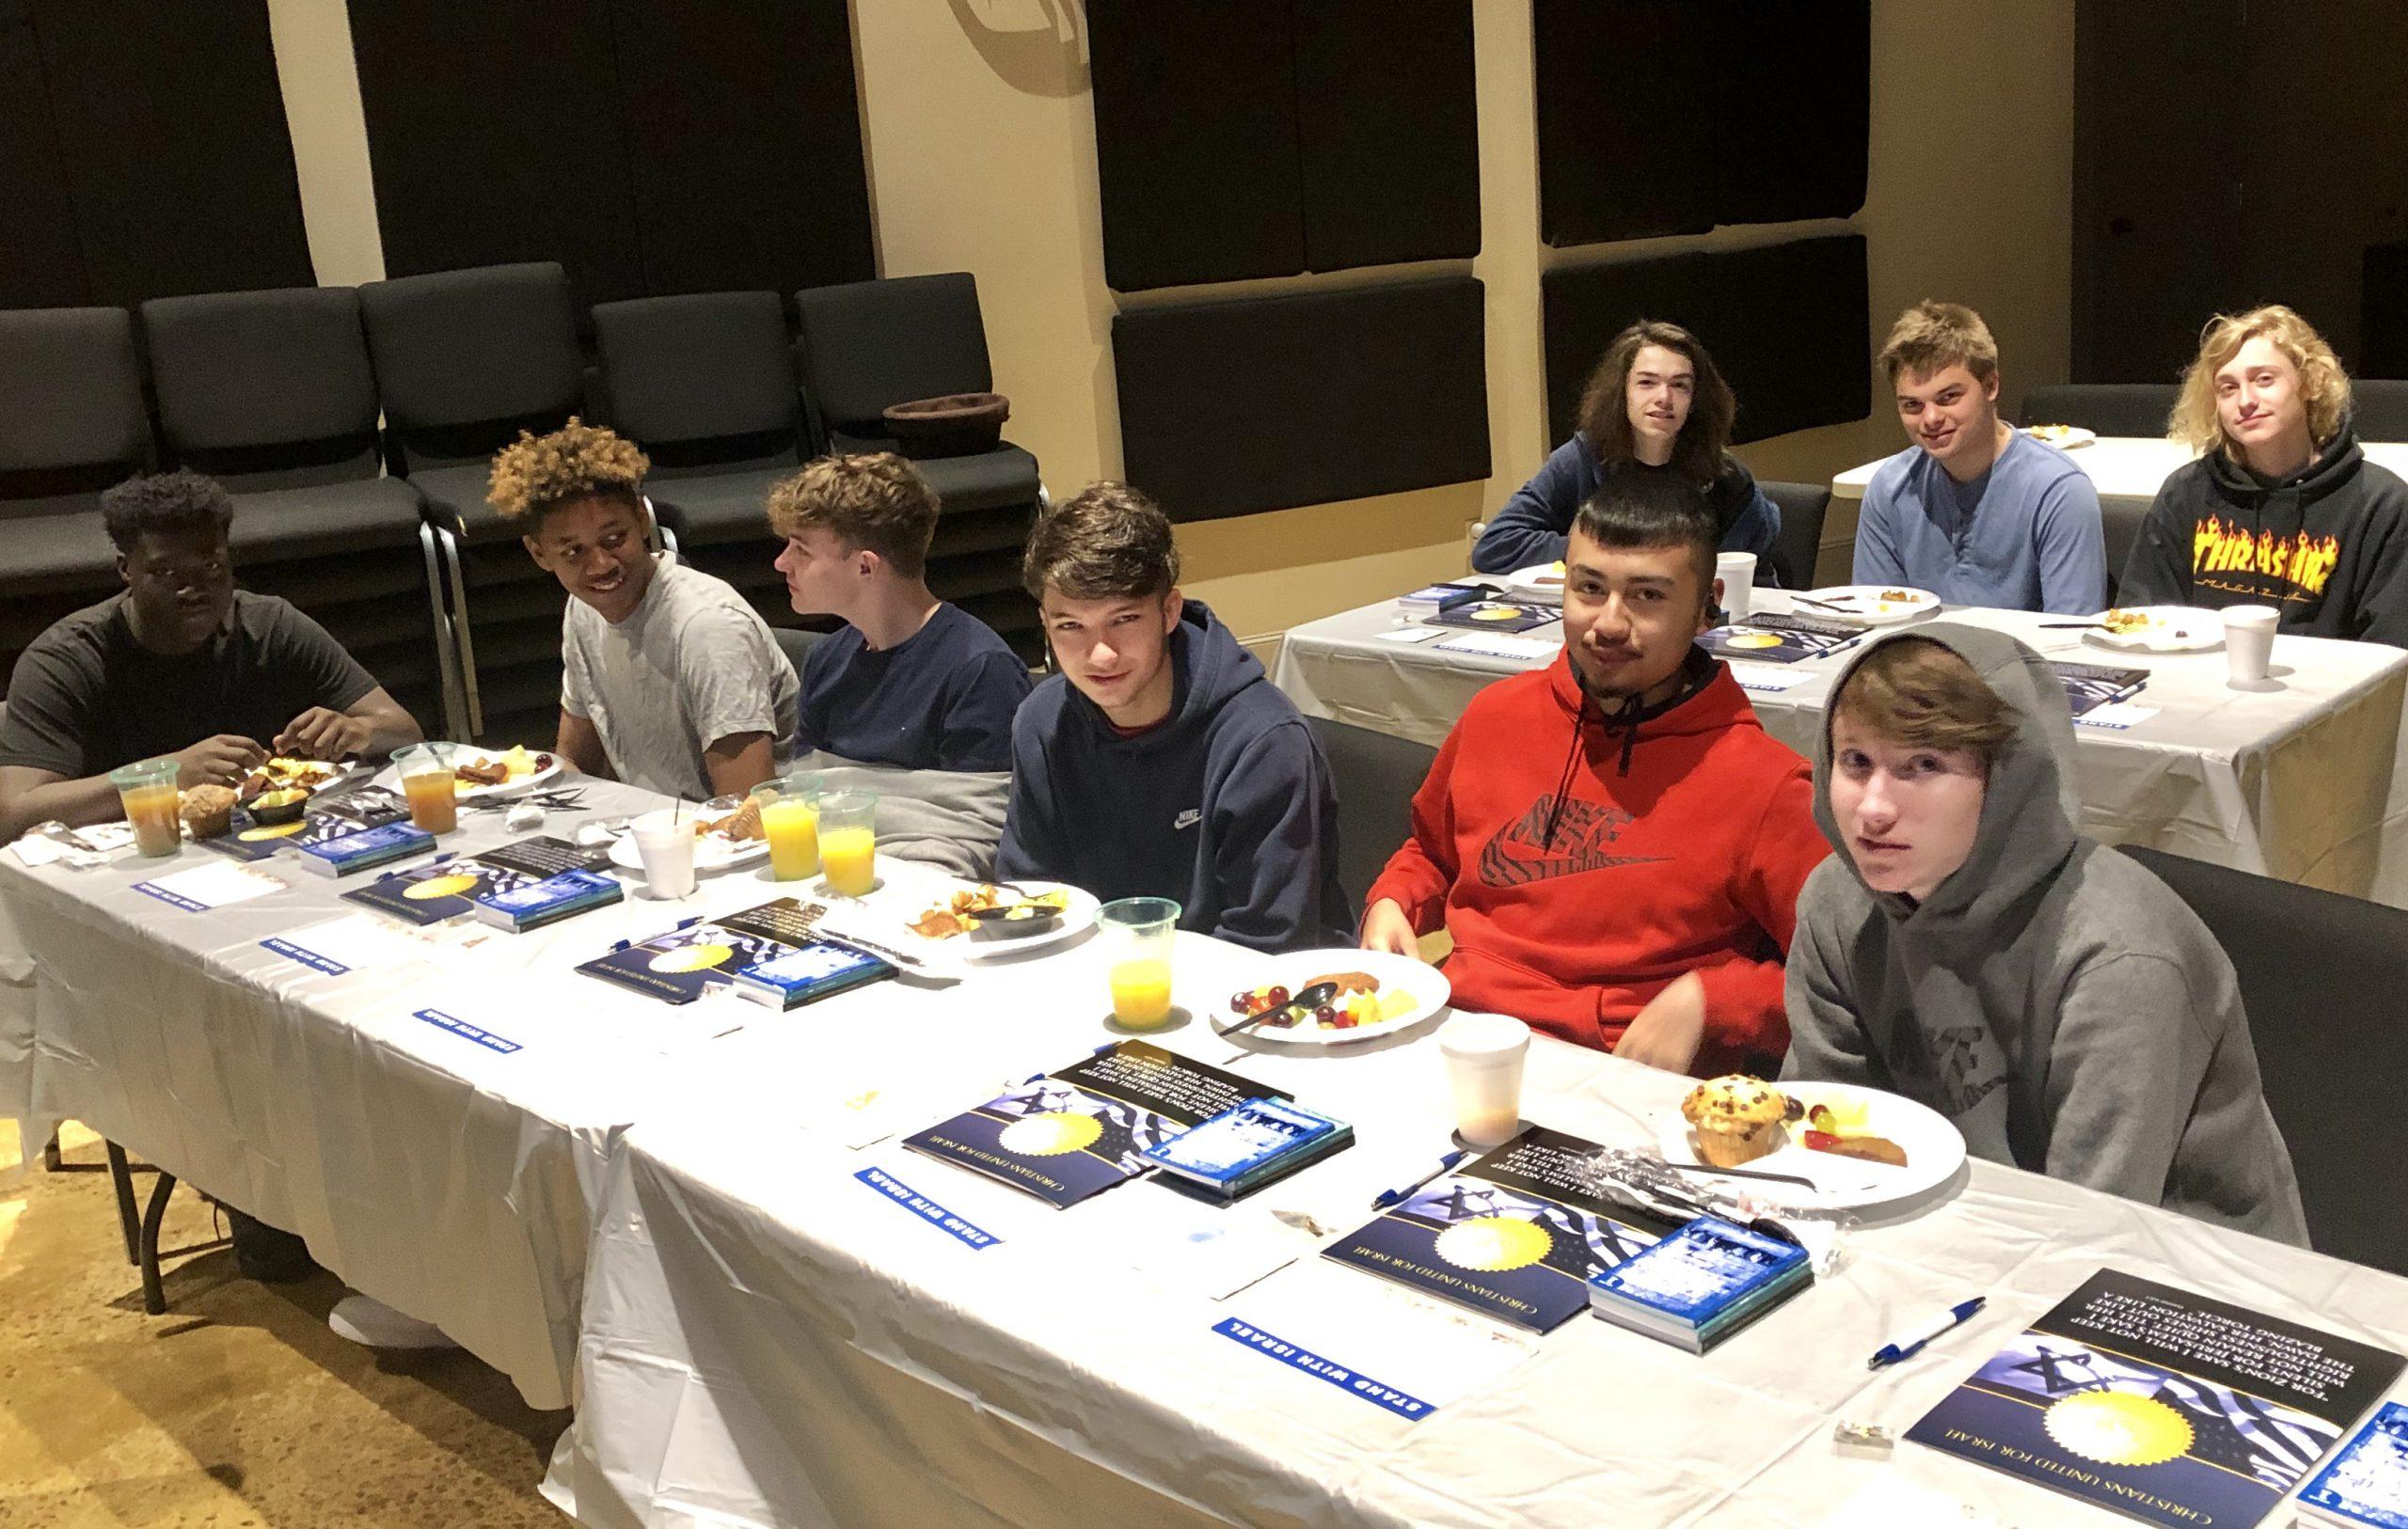 Mar. 23rd Taylors, SC Israel Advocacy Luncheon